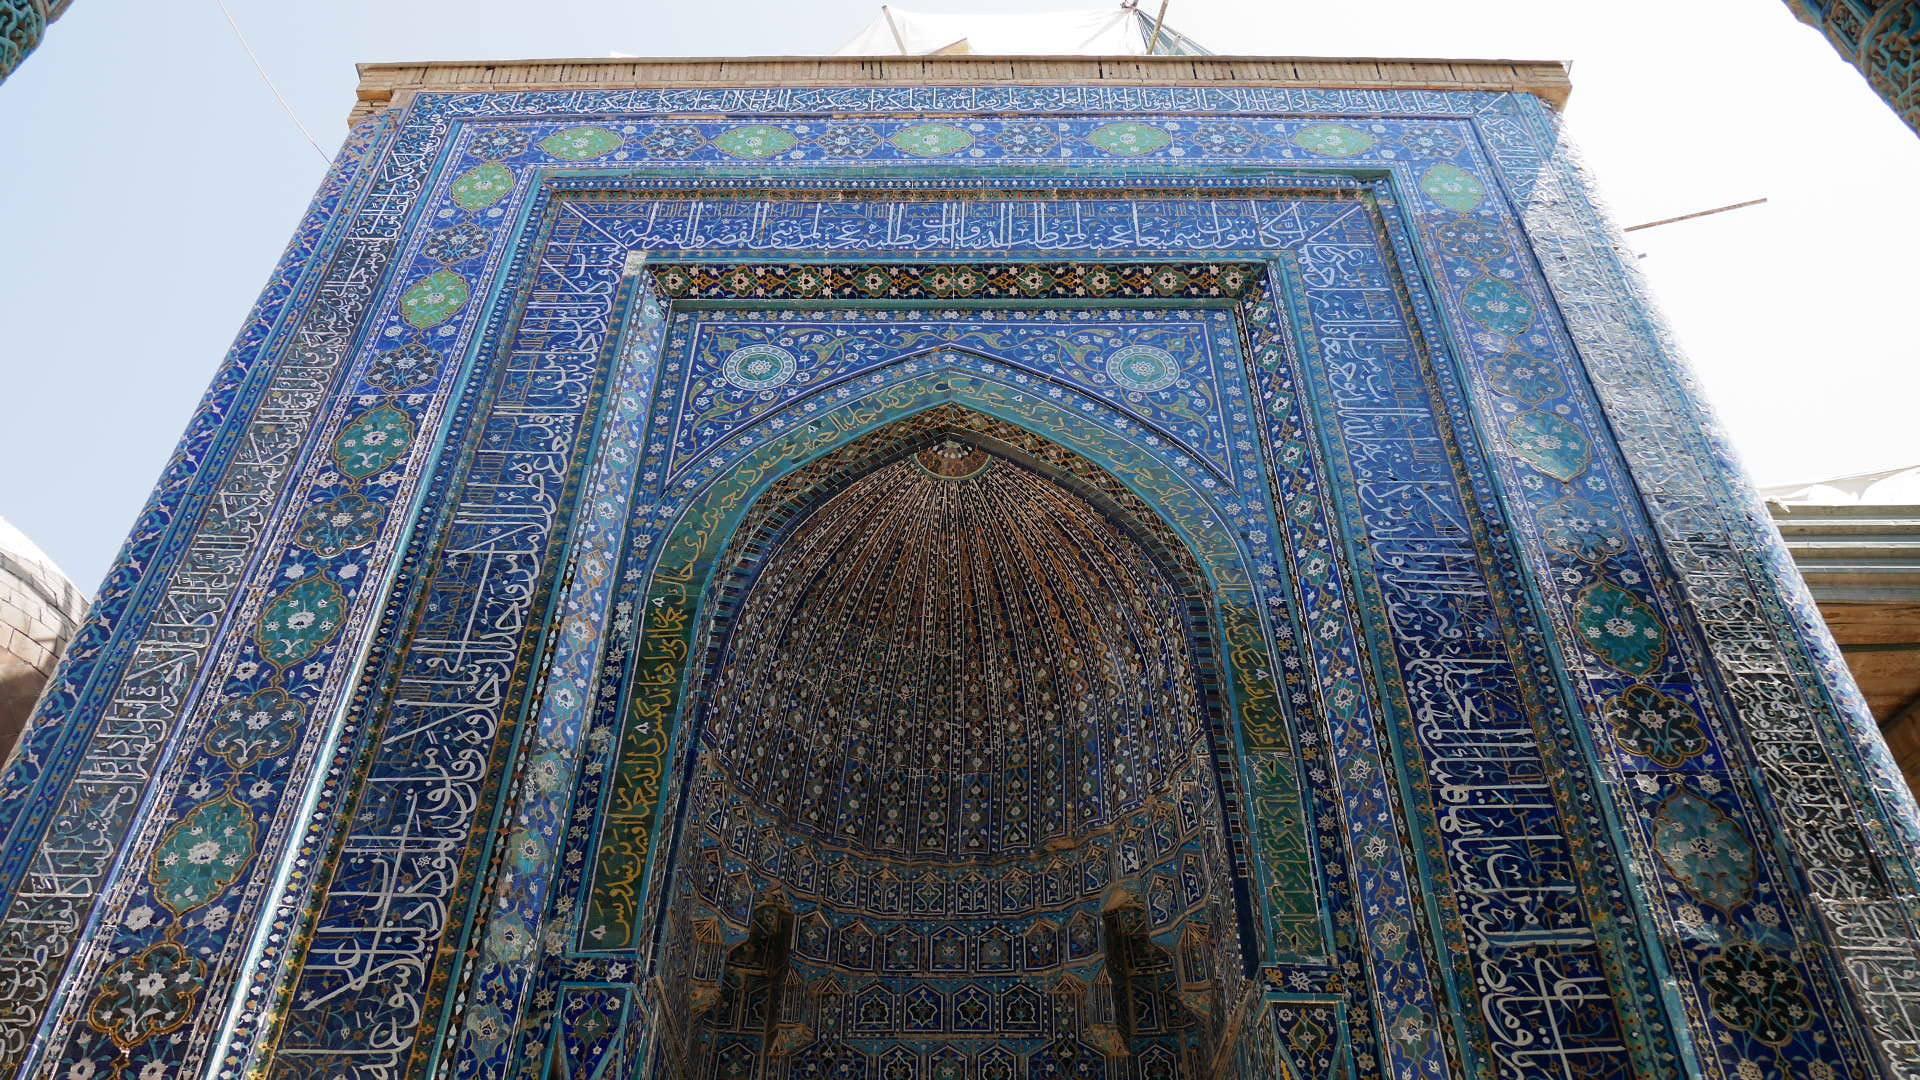 Photo 2: Shah-i-Zinda, Samarcande, le coeur de la route de la Soie